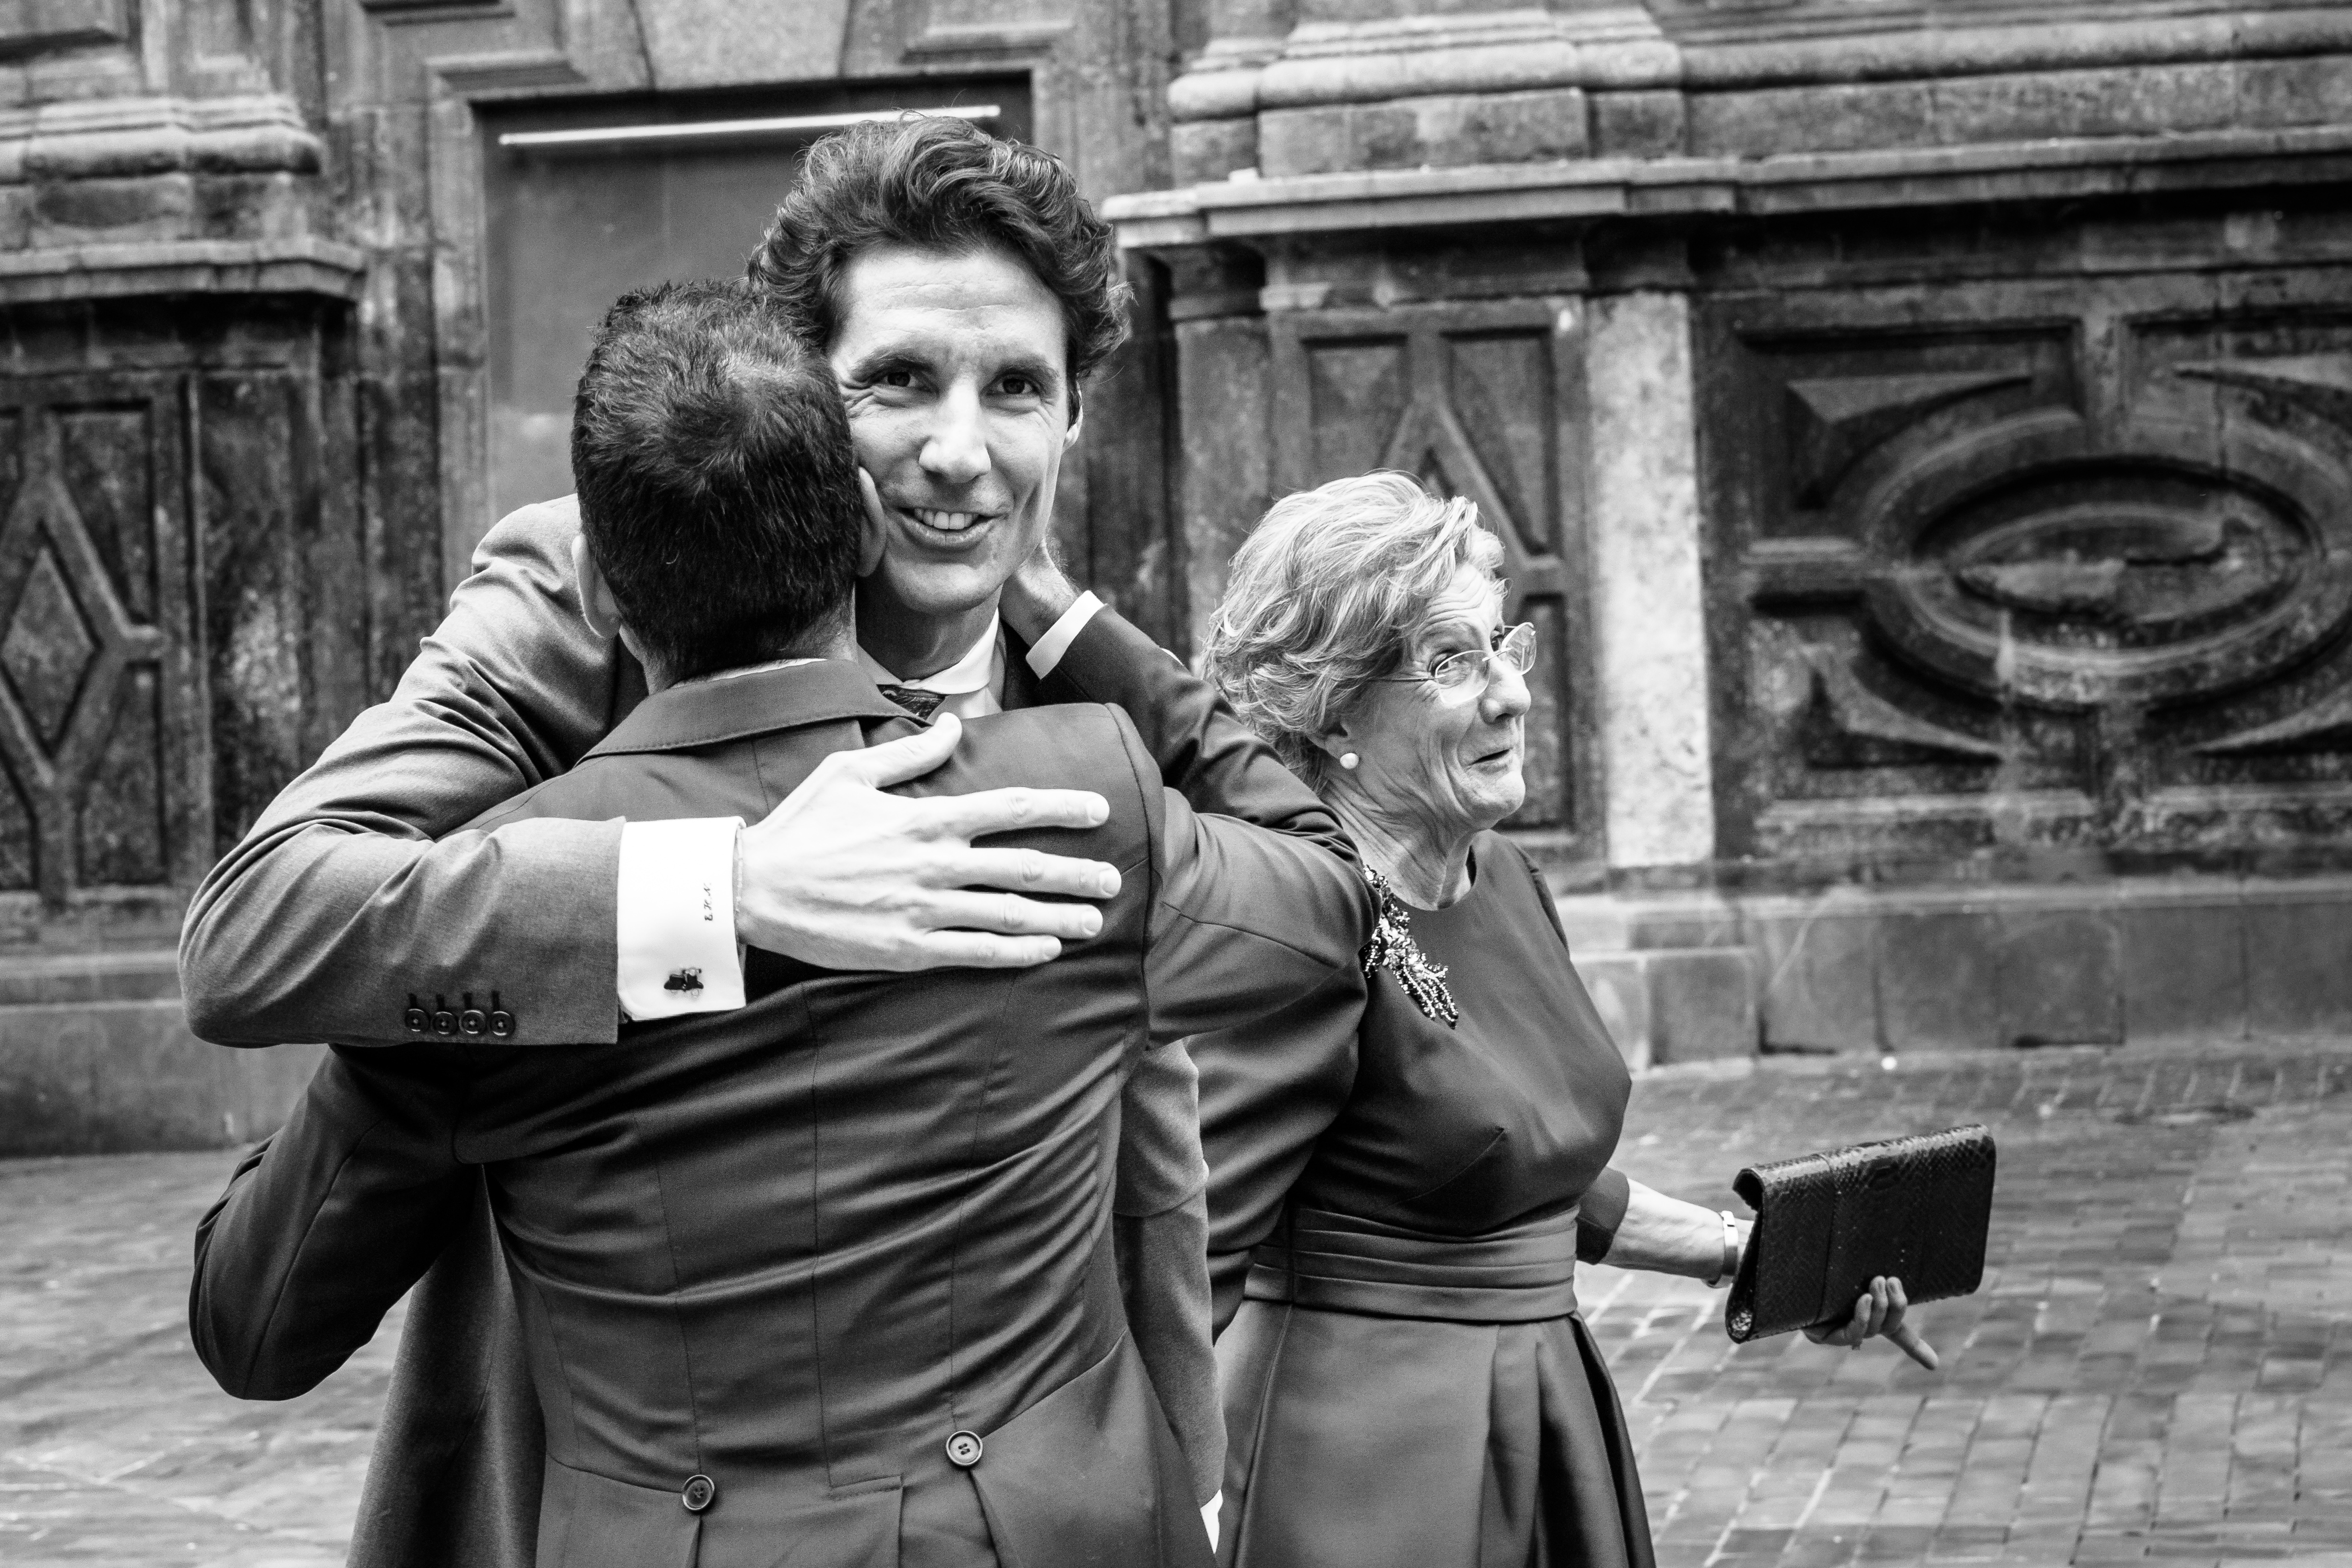 mandarina weddig, fotografos de boda, fotografo boda soria, fotografo boda barcelona, fotografo boda Madrid, fotografo boda lerida, fotografo boda Huesca_04